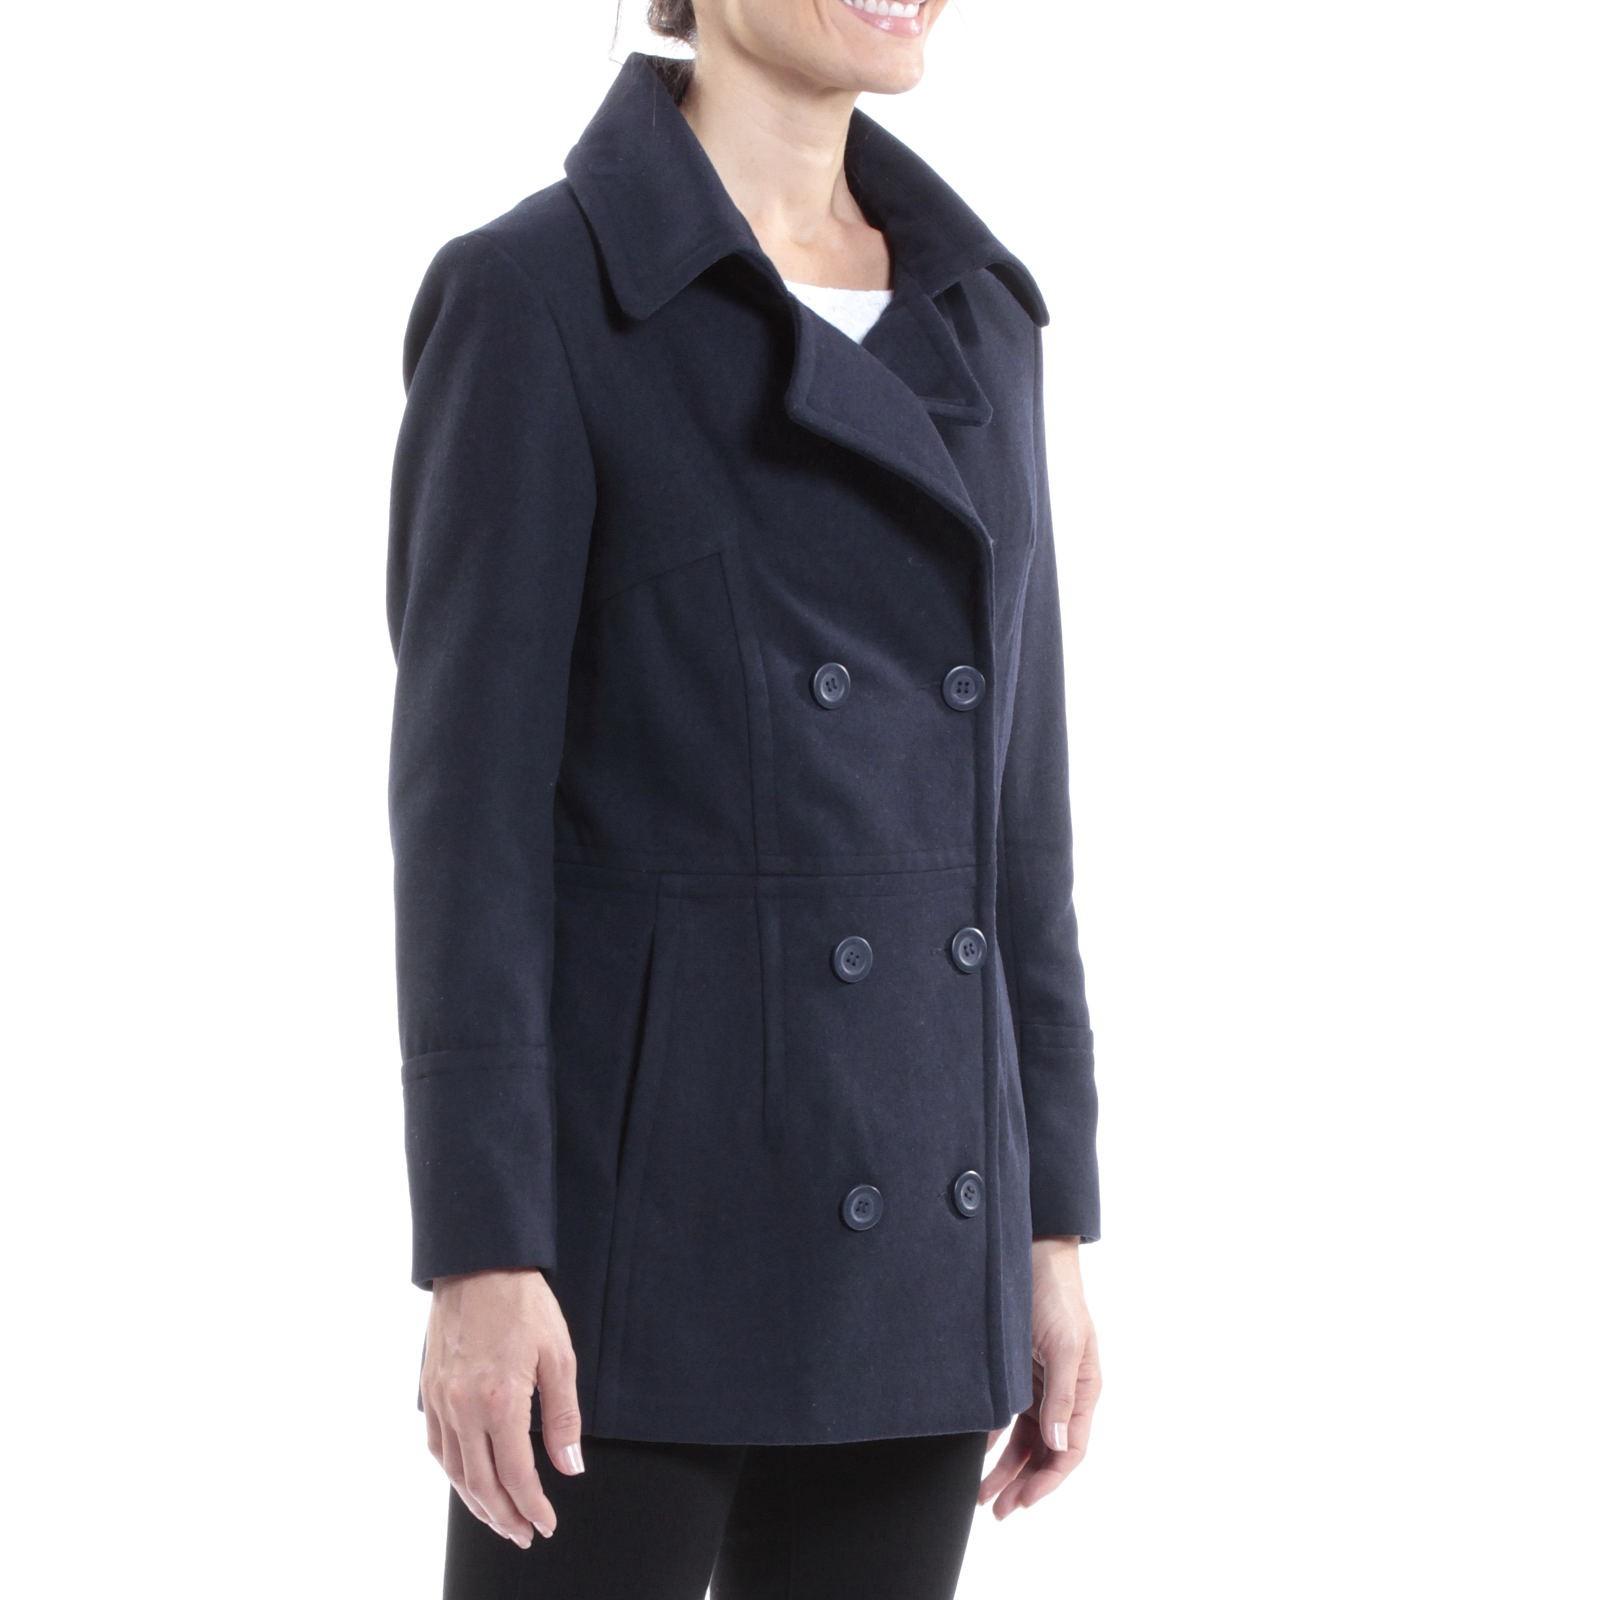 Alpine-Swiss-Emma-Womens-Peacoat-Jacket-Wool-Blazer-Double-Breasted-Overcoat-New thumbnail 49